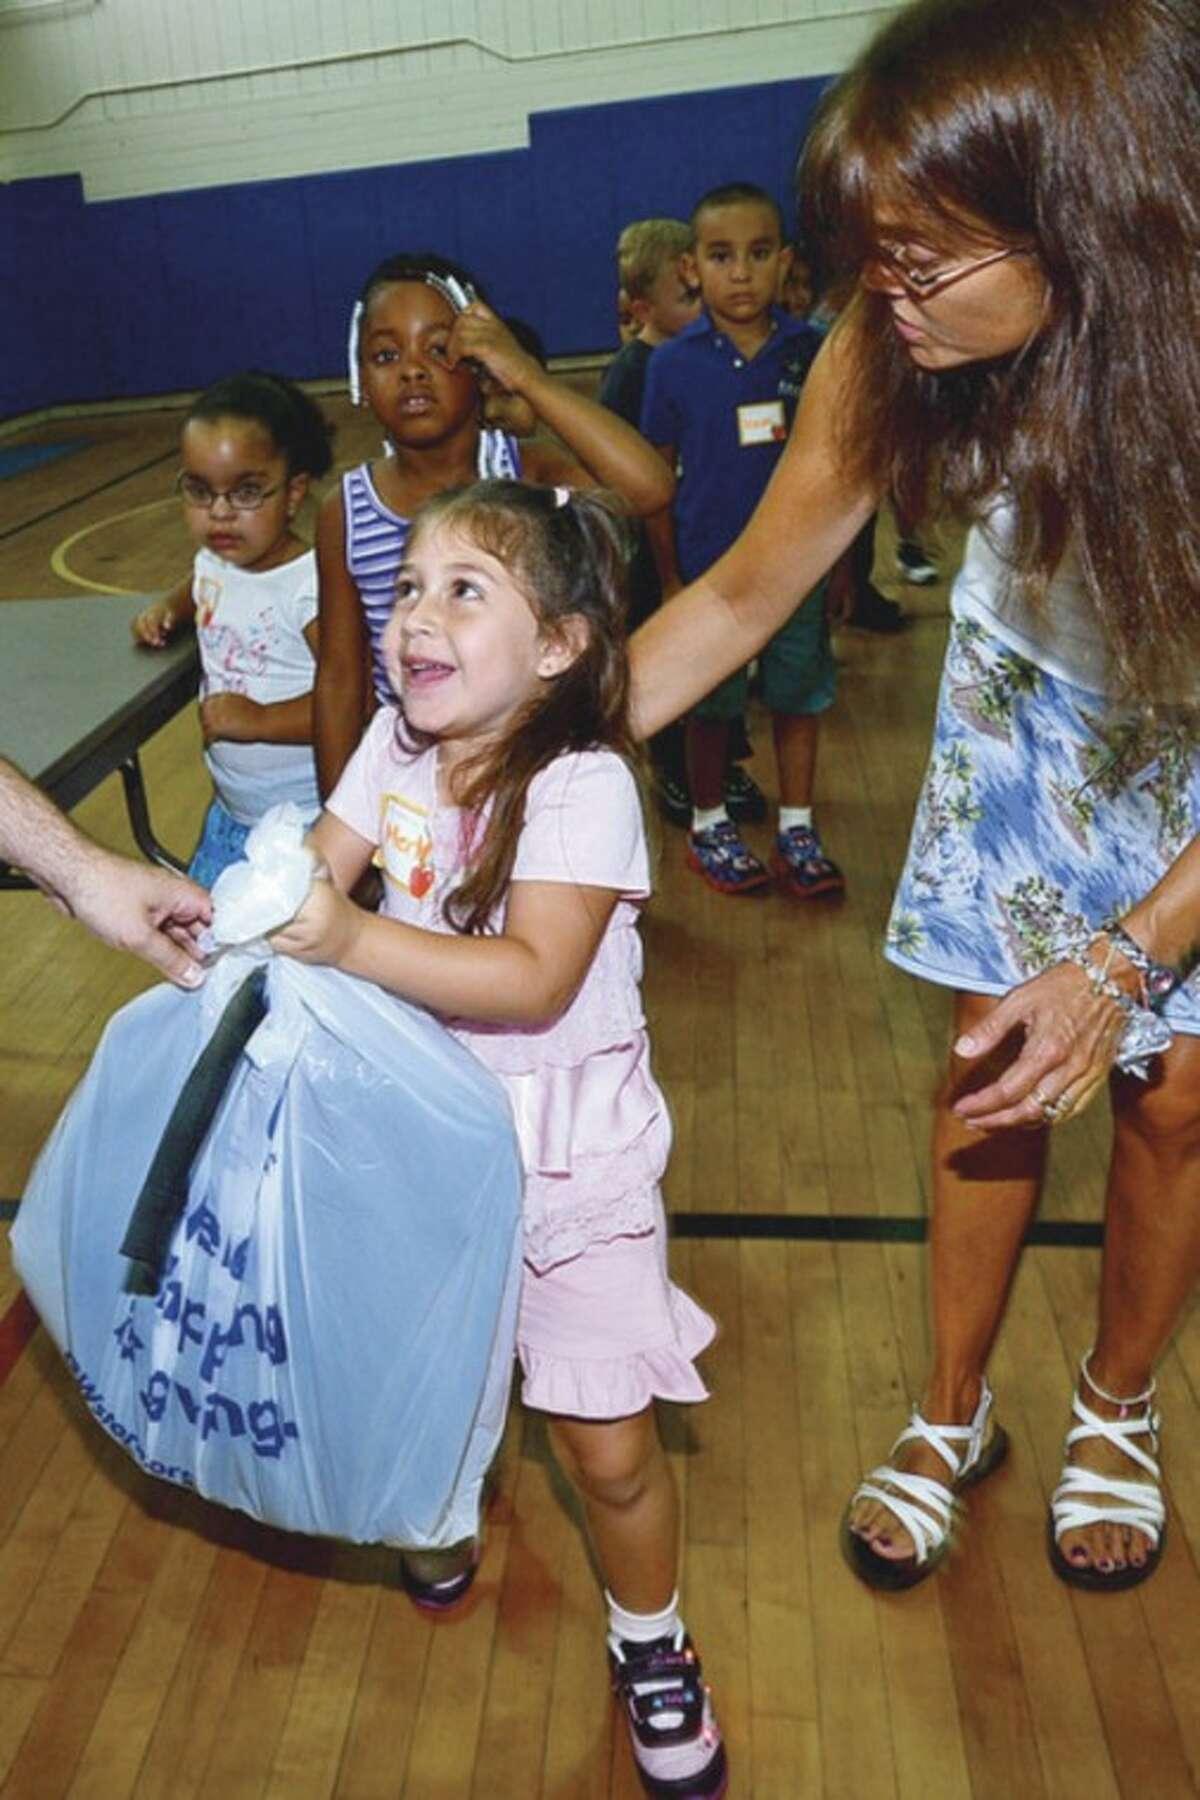 Goodwill donates over 500 backpacks to Kendall Elementary School students including kindergartner Merly Enriquez Thursday. Hour photo / Erik Trautmann